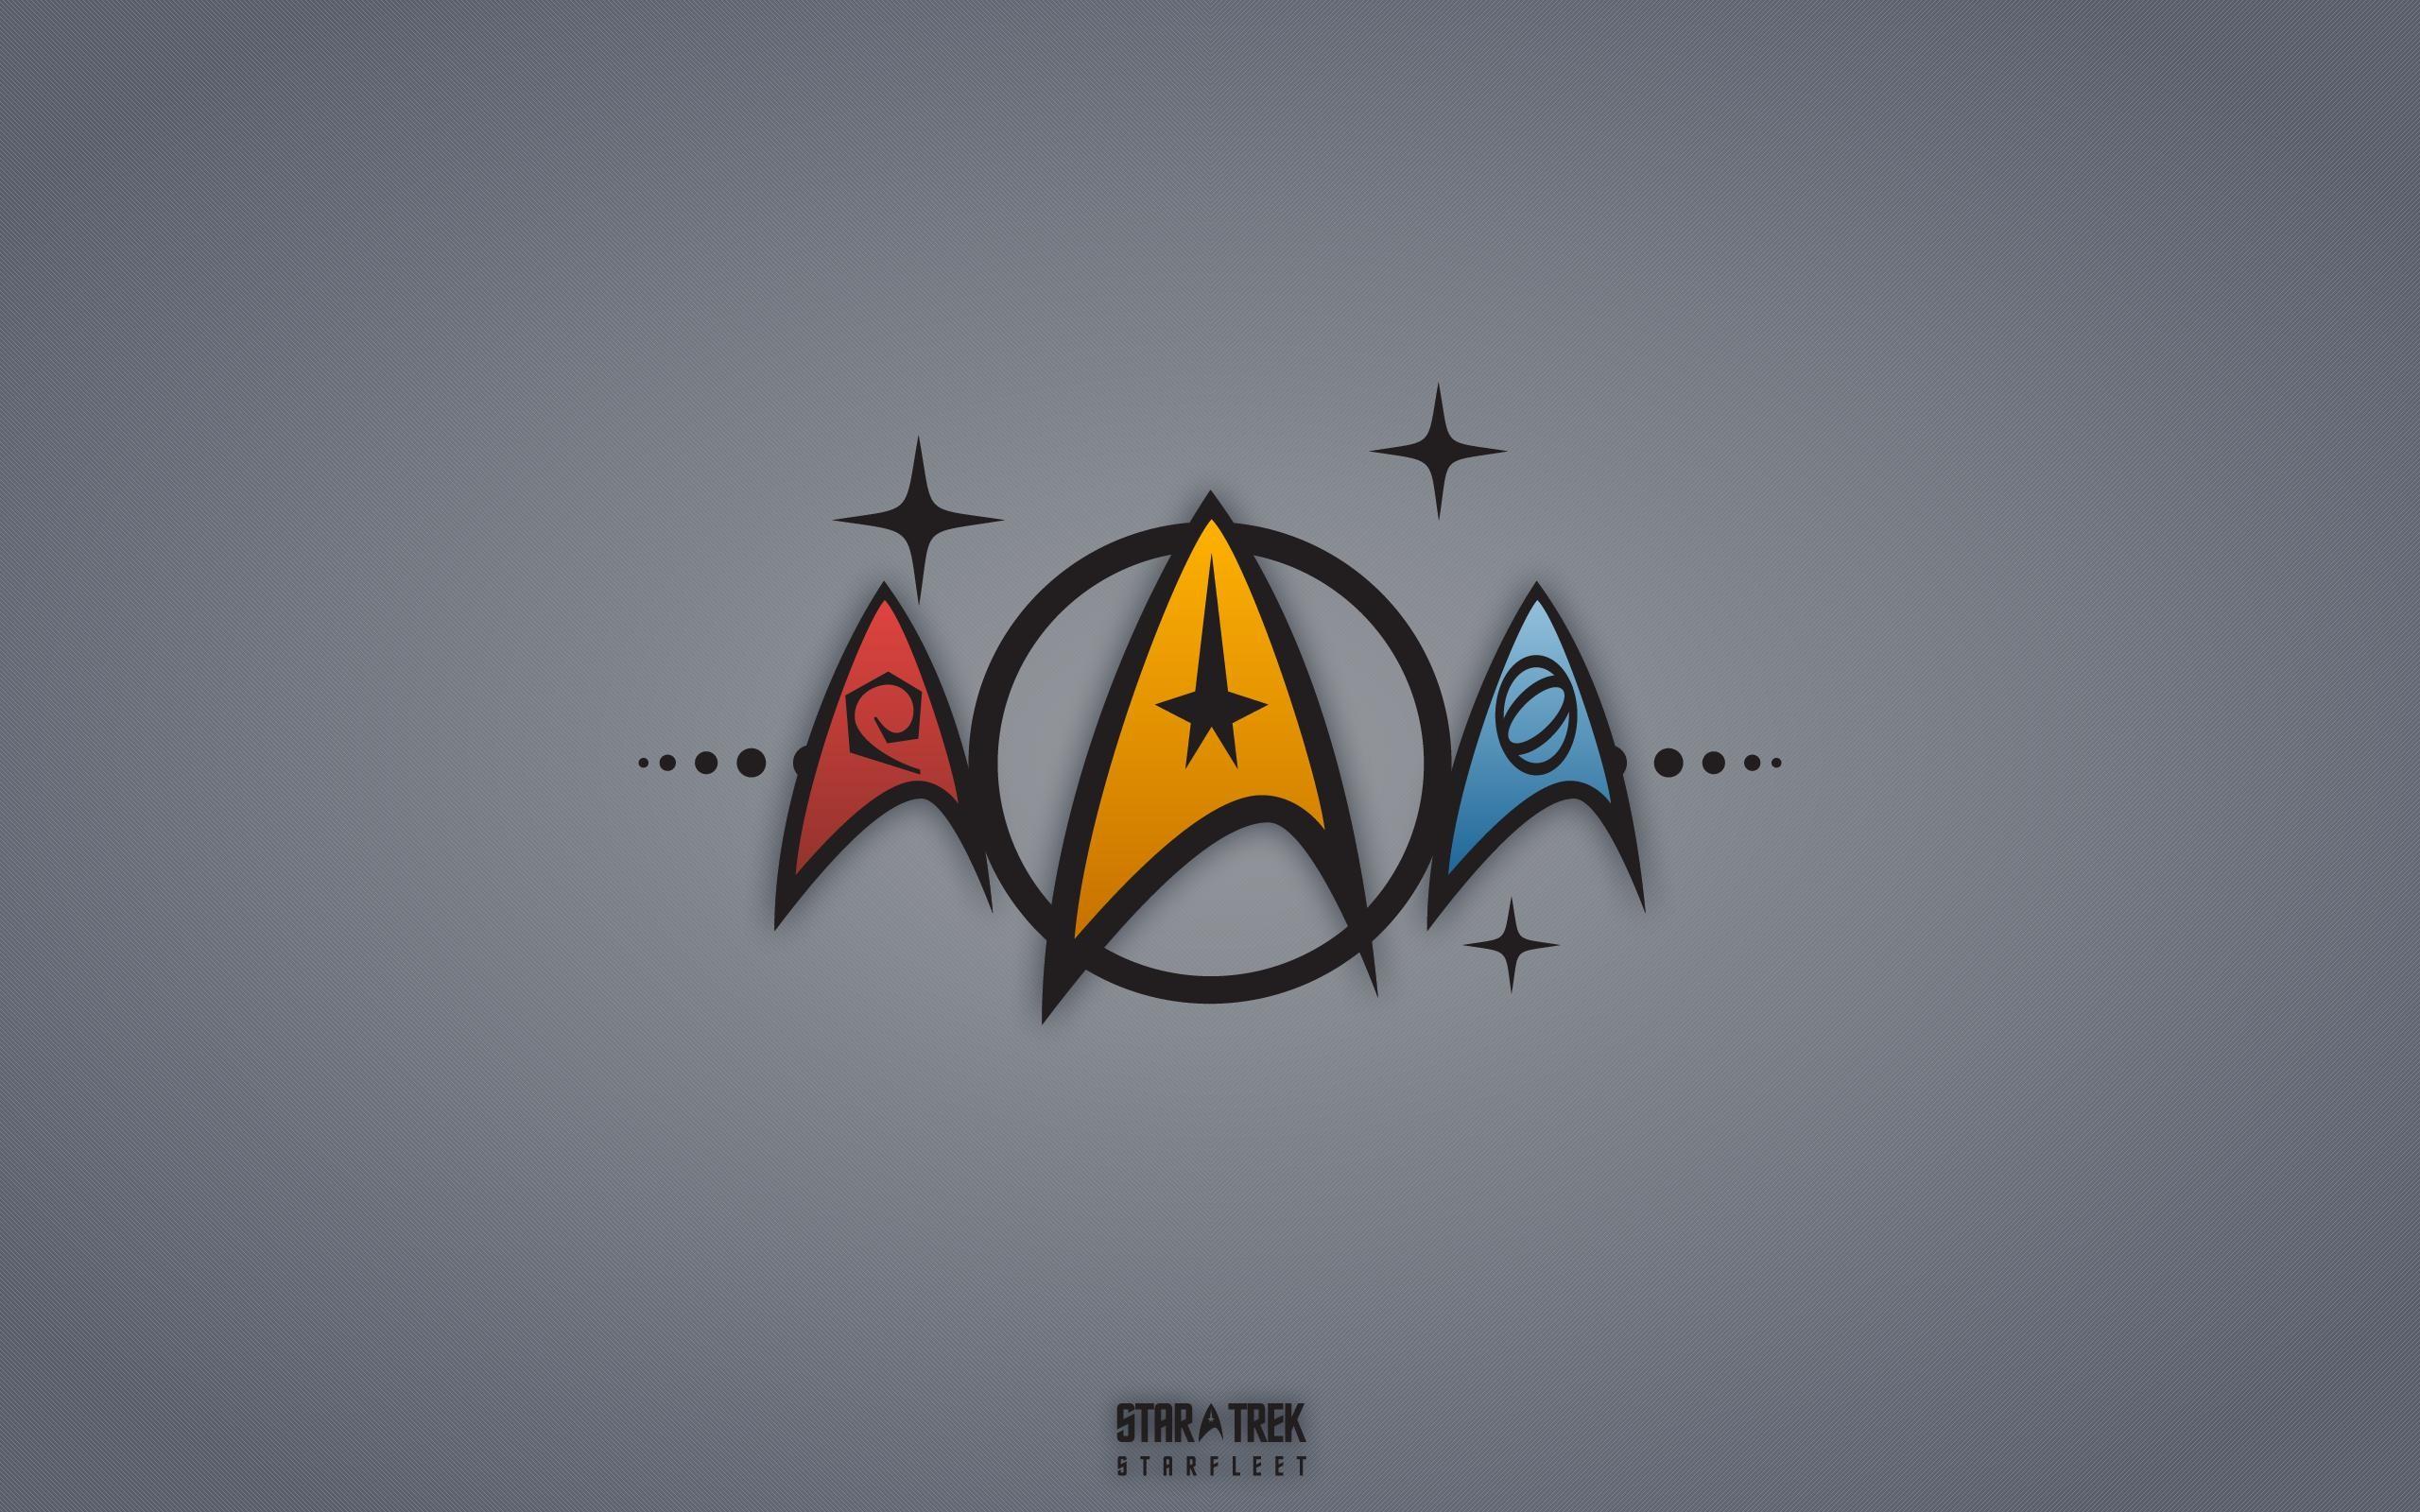 Star trek tardis klingons doctor who crossovers wallpaper .